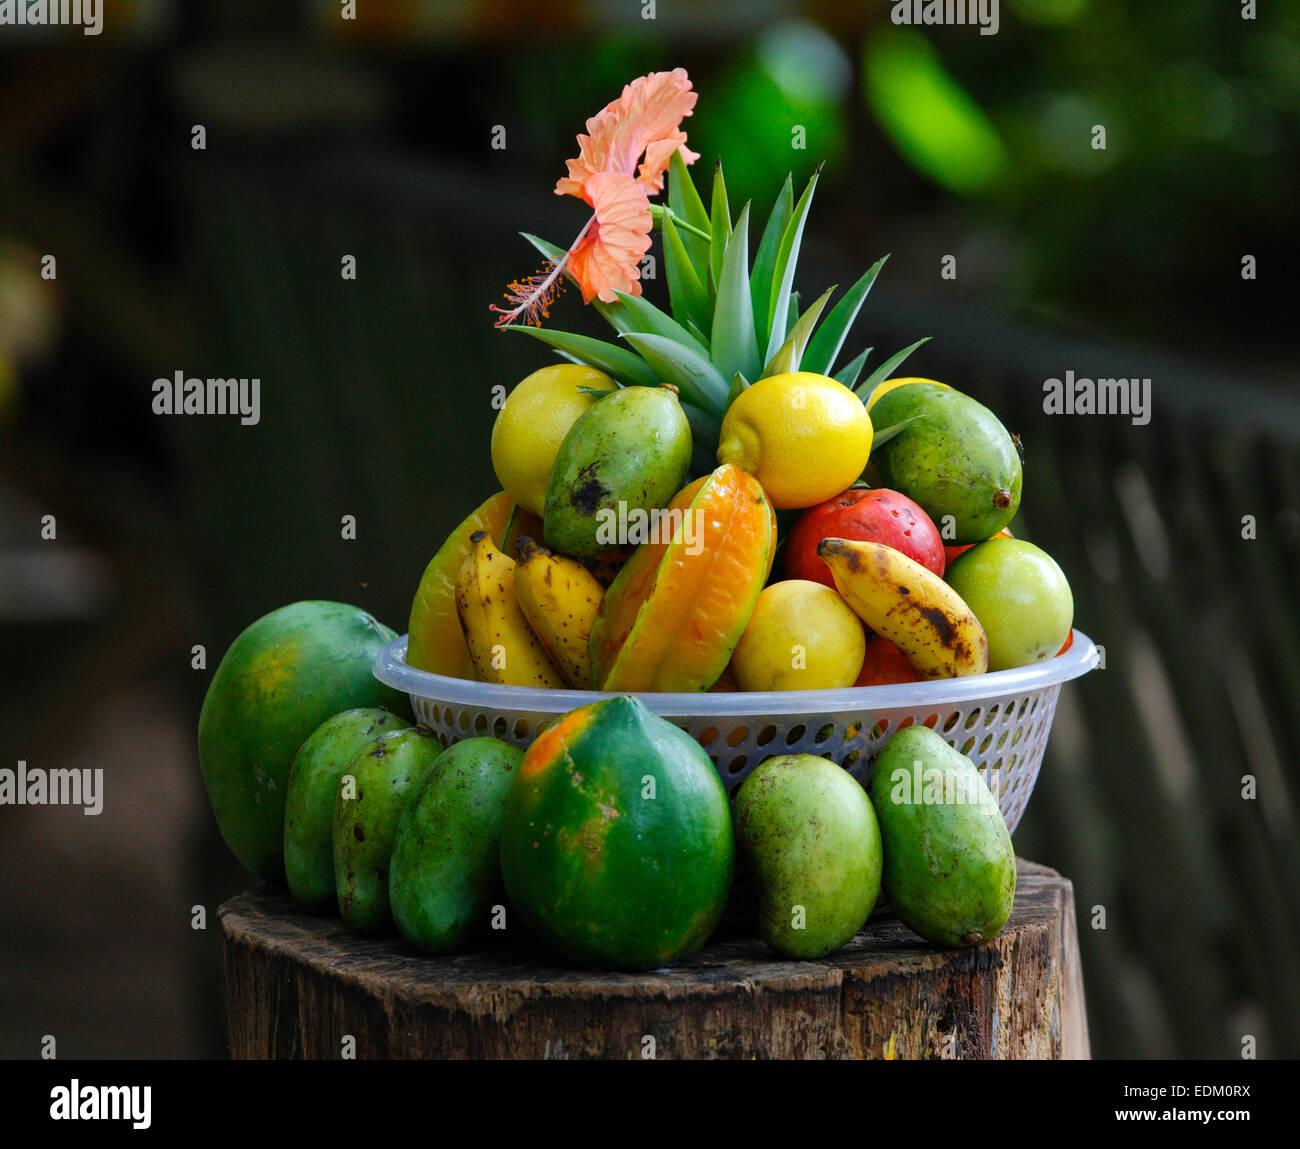 Seychelles tropical fruits, island, La Digue - Stock Image